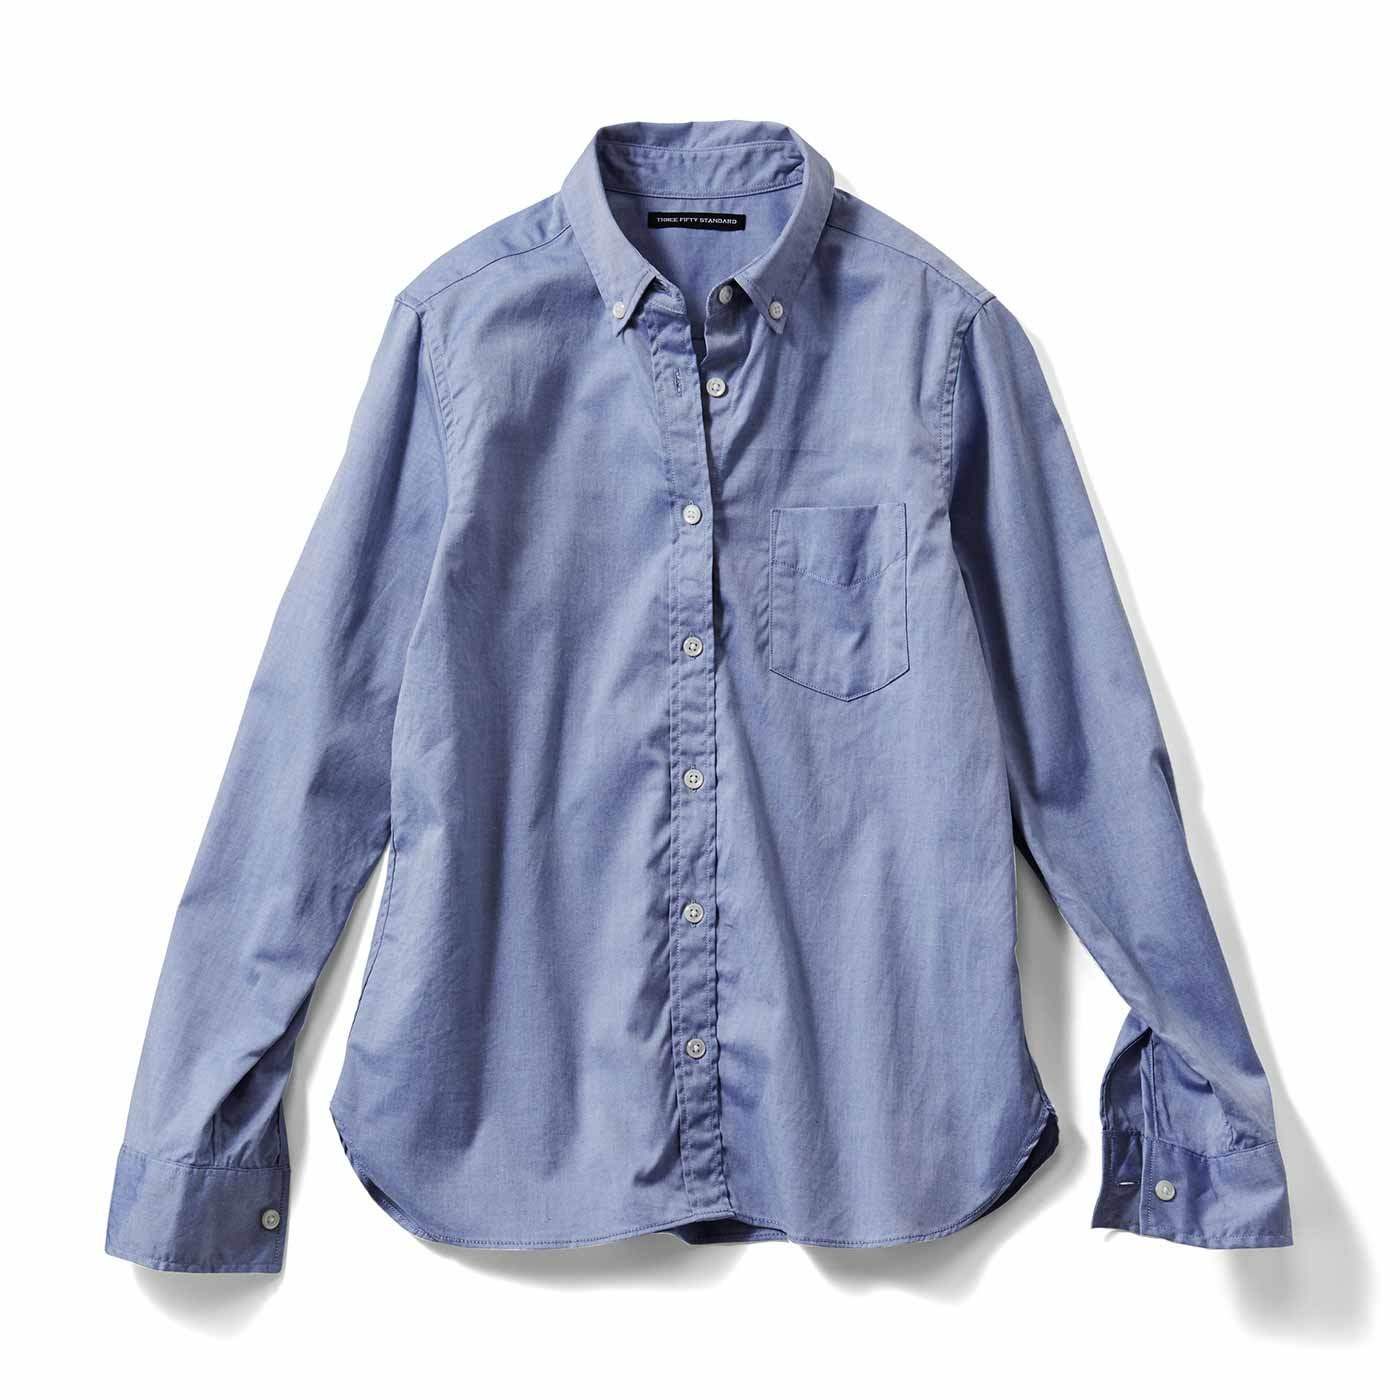 THREE FIFTY STANDARD 定番ボタンダウンシャツ〈ブルー〉